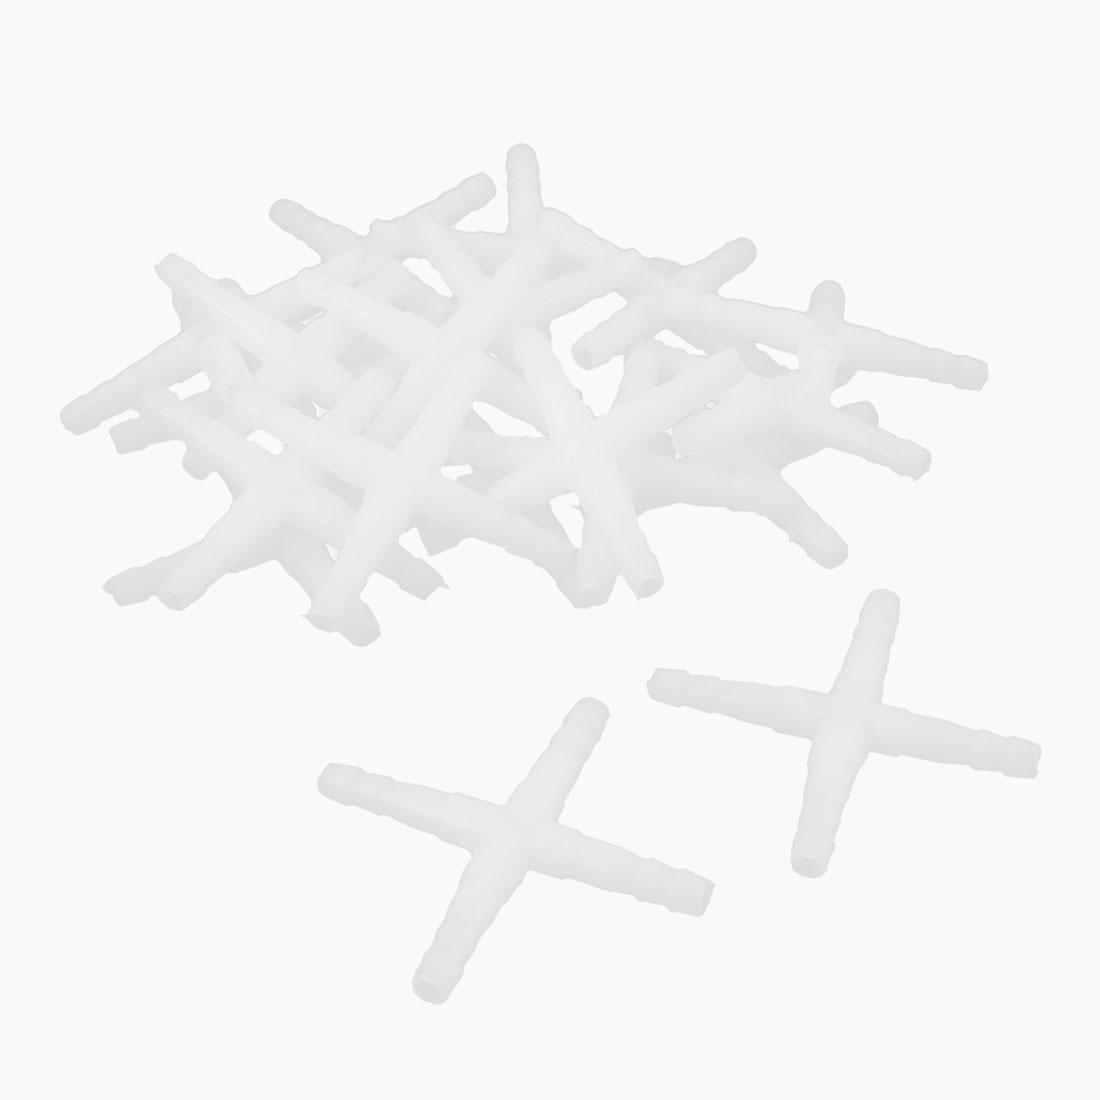 Aquarium White Plastic 4 Way Air Valve Line Connectors 20 Pcs